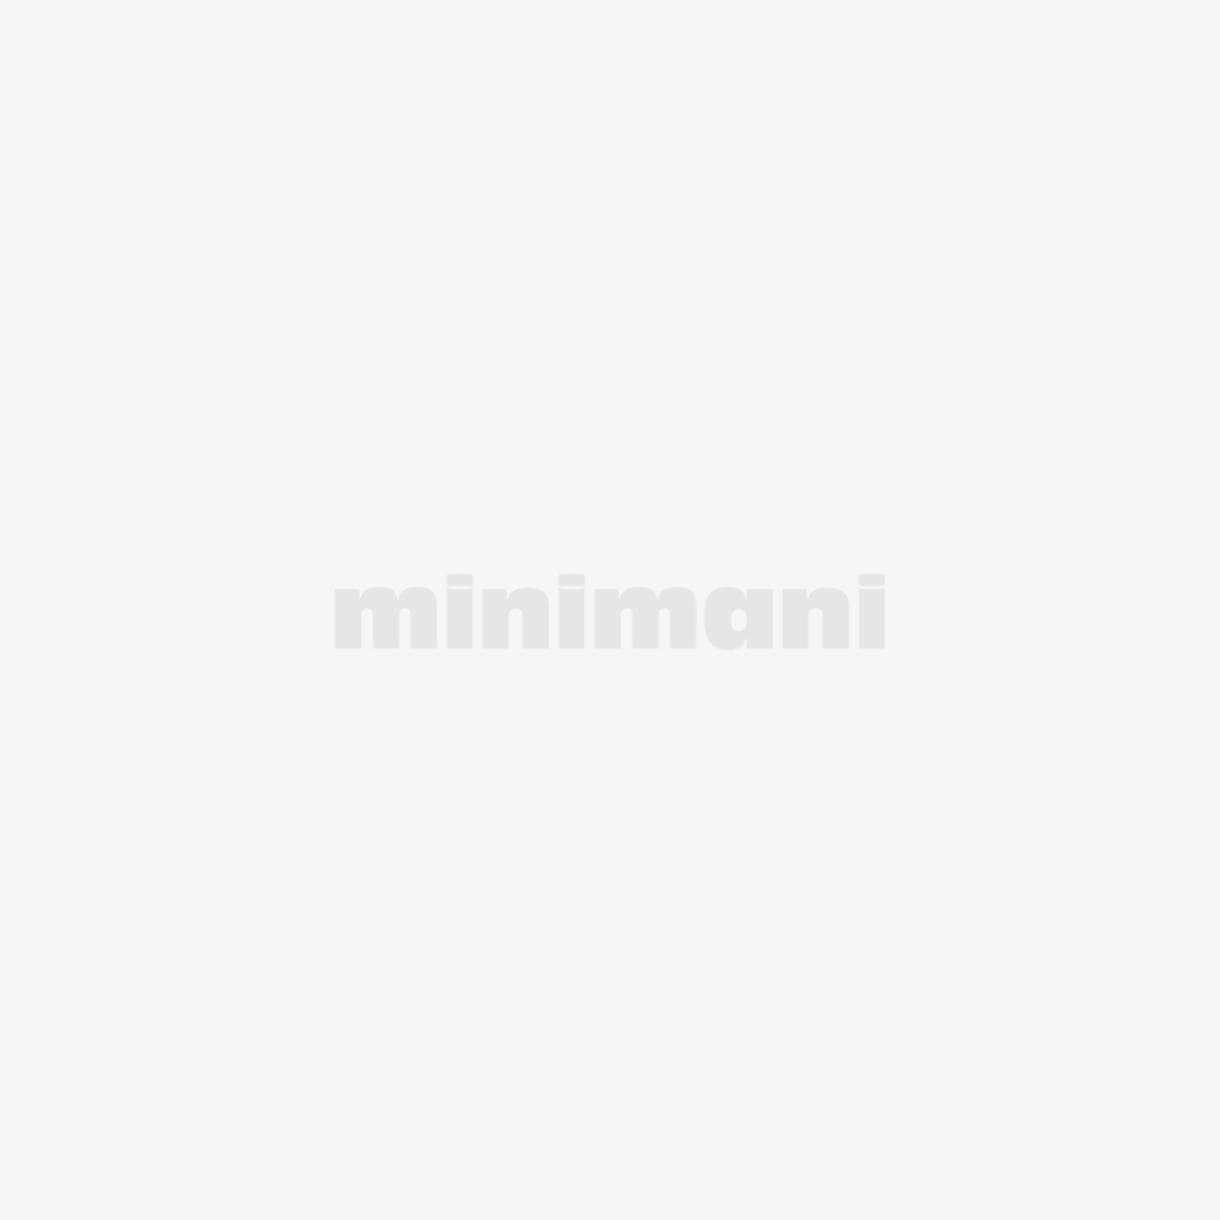 M-FILTER RAITISILMASUODATIN MAC 8051 MB C 00-07, CLK 02-